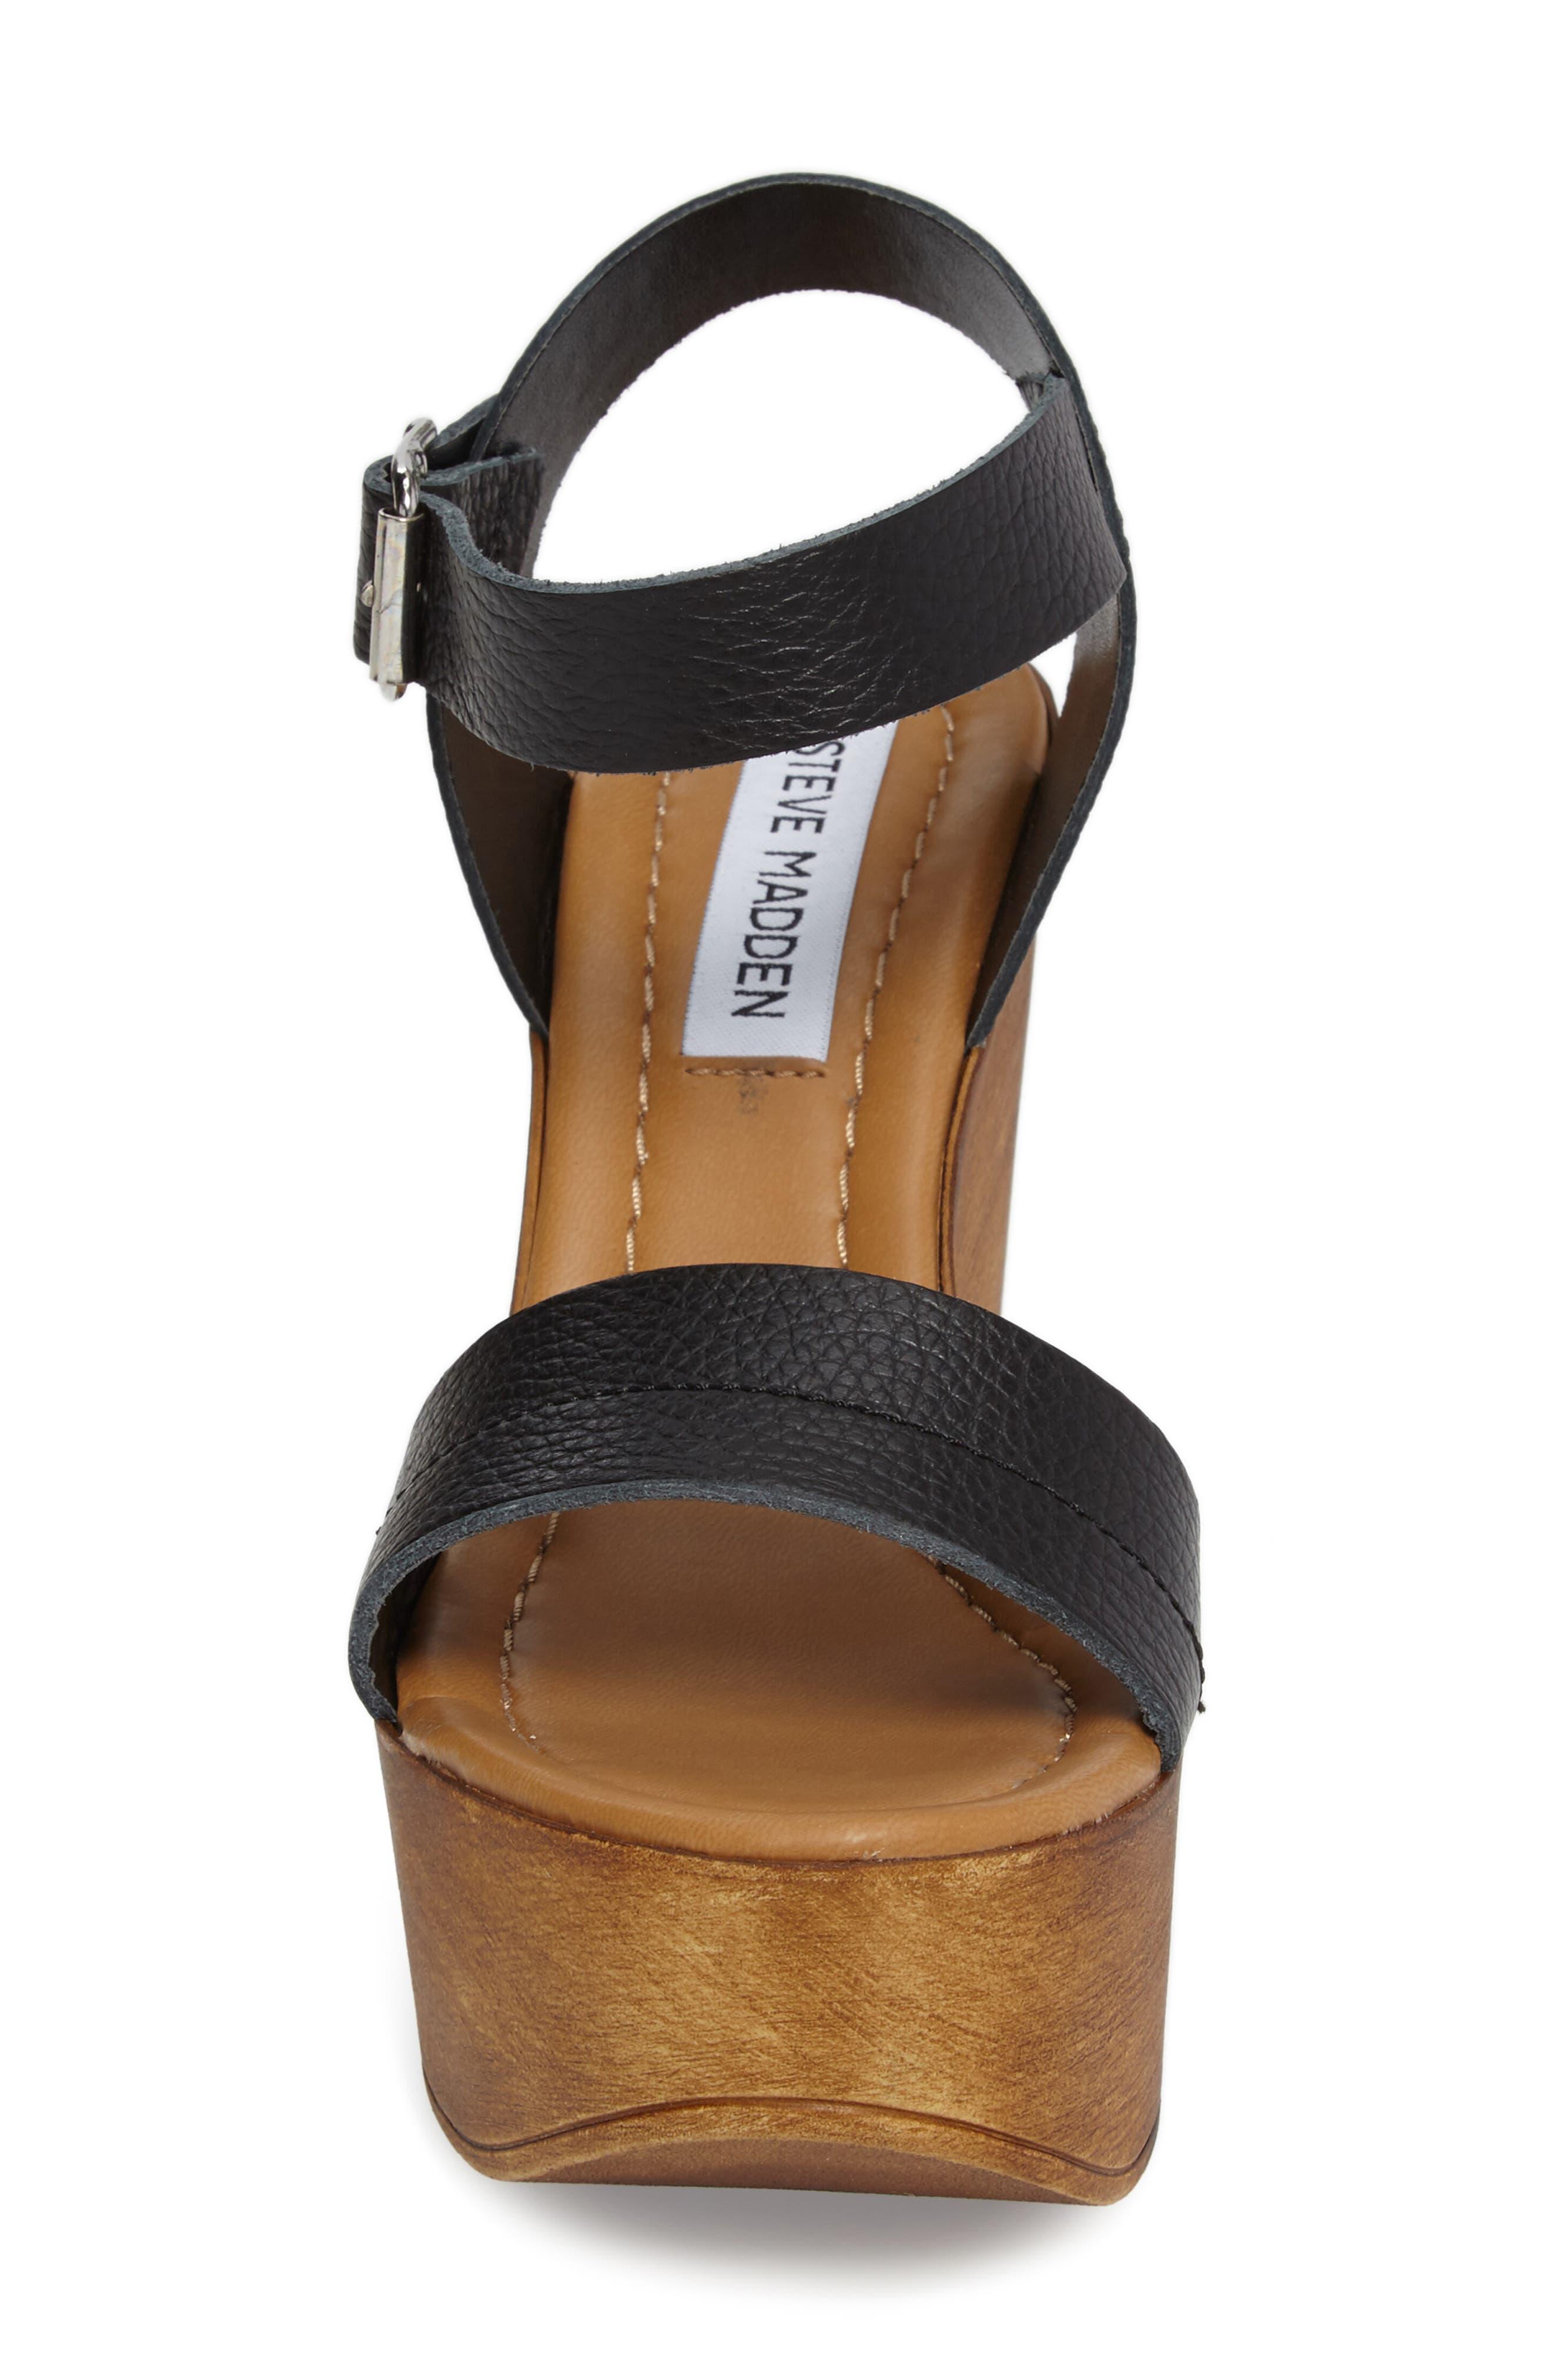 Belma Wedge Sandal,                             Alternate thumbnail 4, color,                             Black Leather